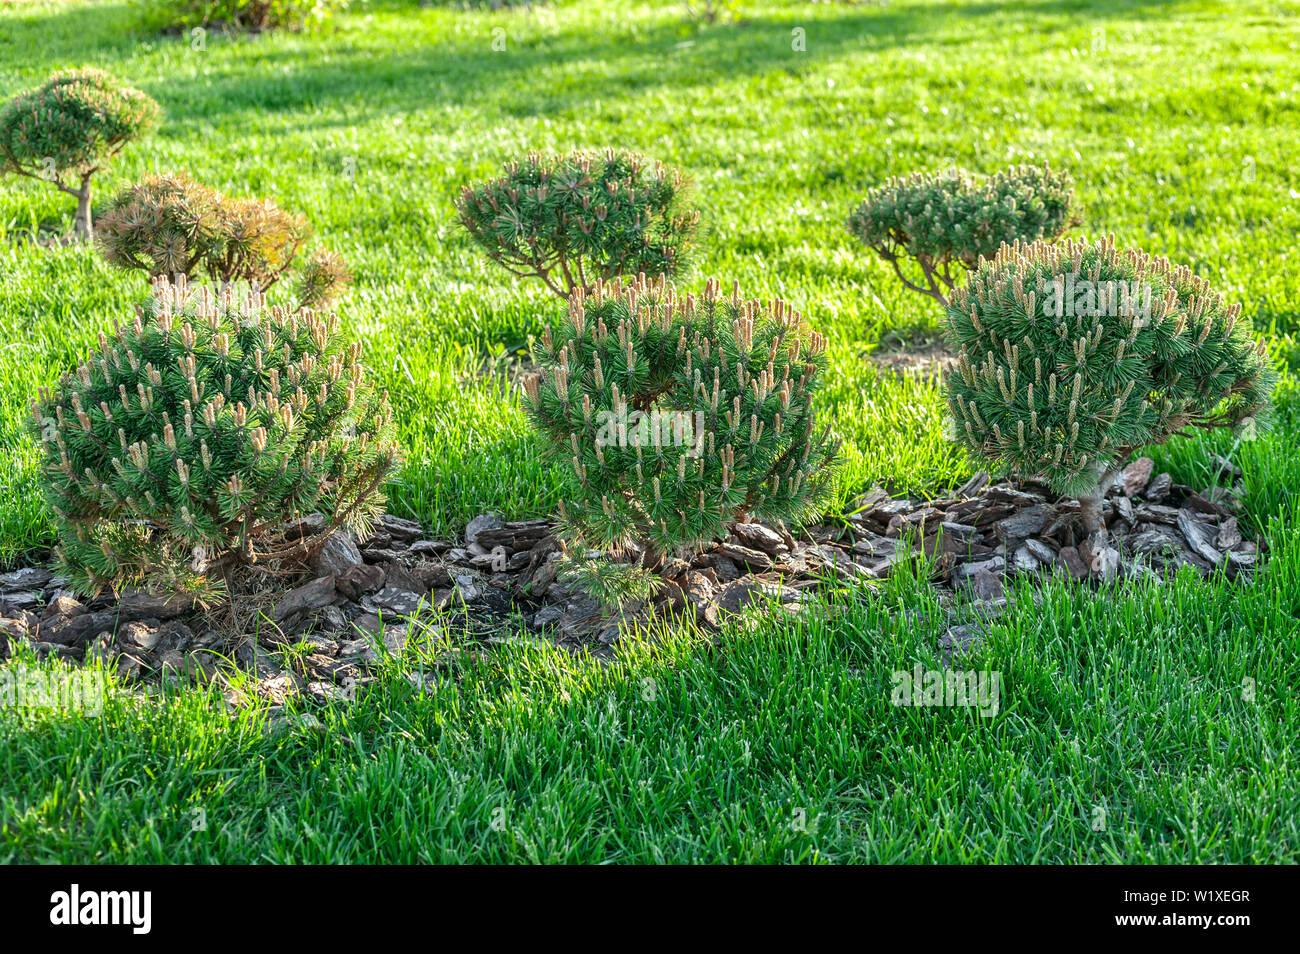 Dwarf pine on a background of green grass. Sunshine sunset - Stock Image